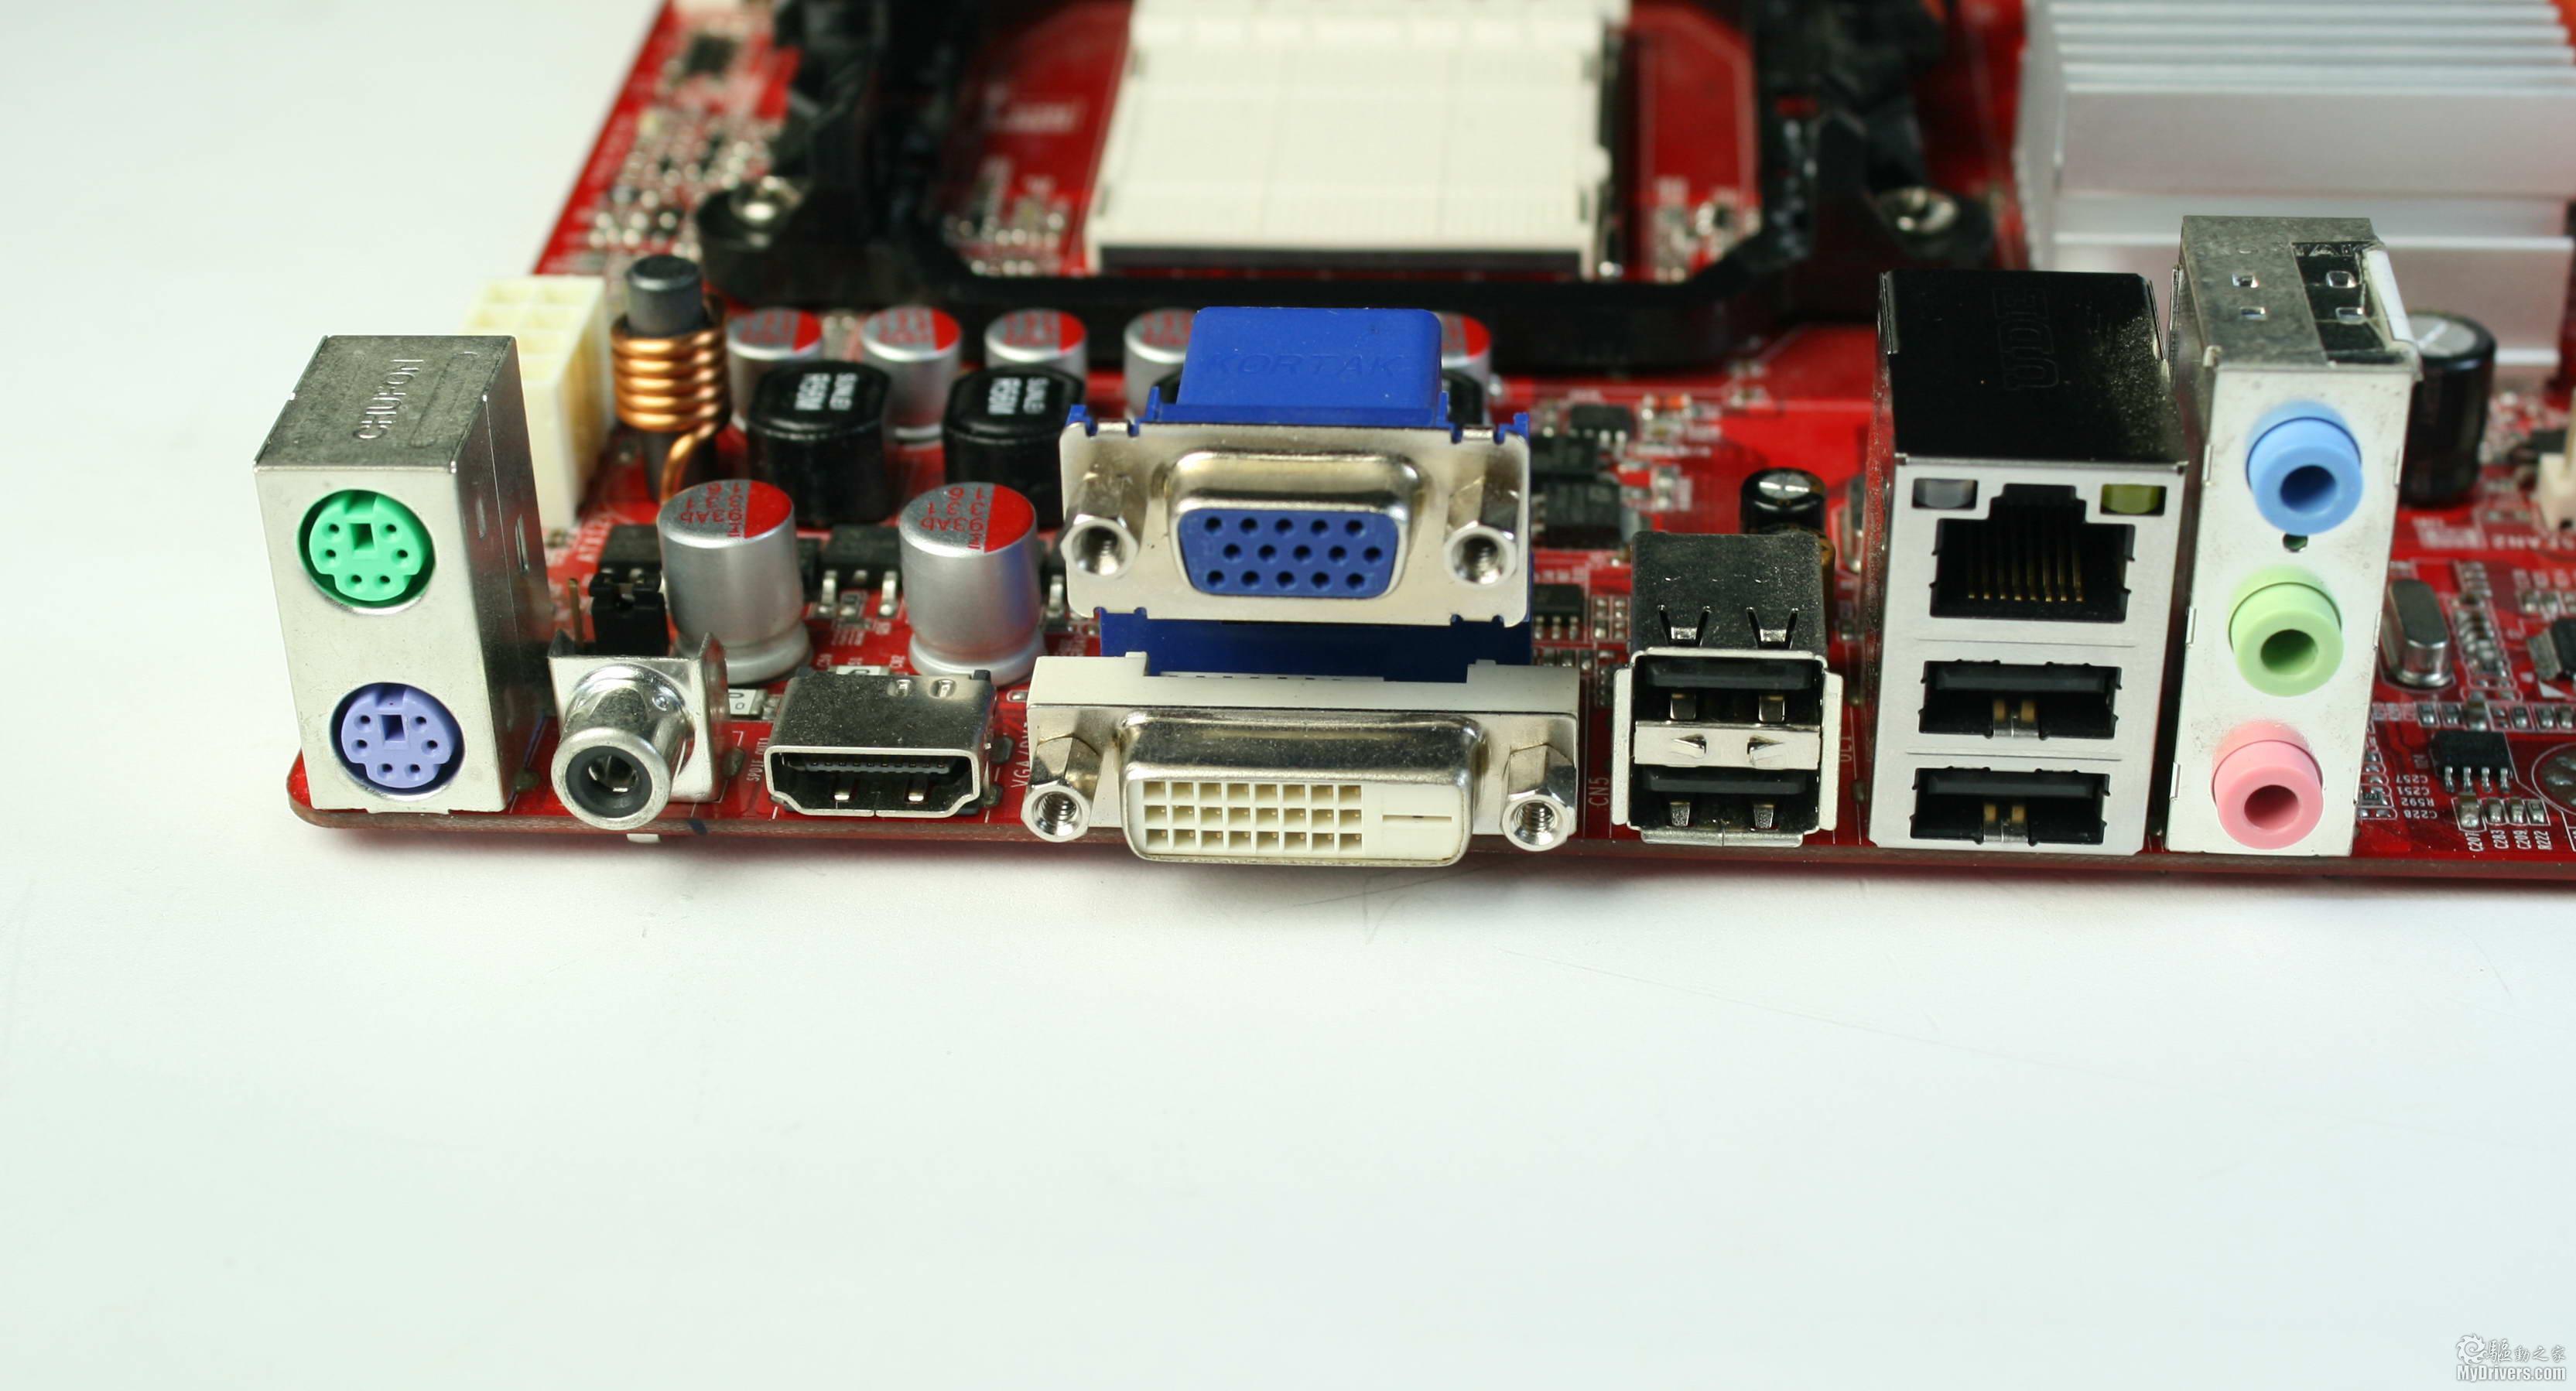 [2.785G主板解析] 785G研发代号RS880,相比之下780G的研发代号为RS780,790GX为RS780D,虽然在研发代号上高于790GX,但是最终的命名和定位却在790GX之下。785G内部整合的显示芯片为HD 4200,支持DX10.1规格,相当于HD 3450级别,而790GX整合的显示芯片为HD 3300,支持DX10.0,相当于HD 2400级别。除了规格上上有所提升,这两款GPU都是40个流处理器单元,只是为了保持性能差距,HD 4200的核心频率仅有500MHz,低于HD 330